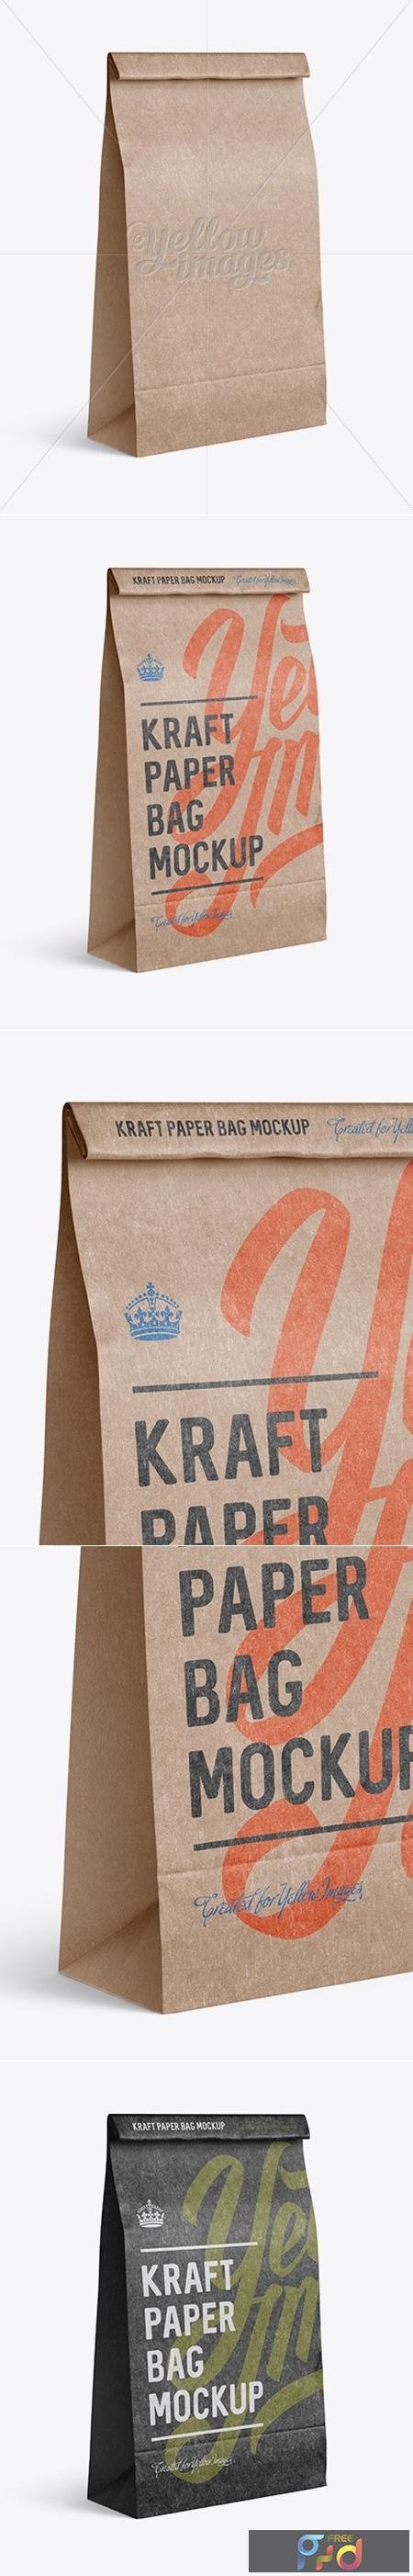 Kraft Paper Food-Snack Bag Mockup - Halfside View 16918 1